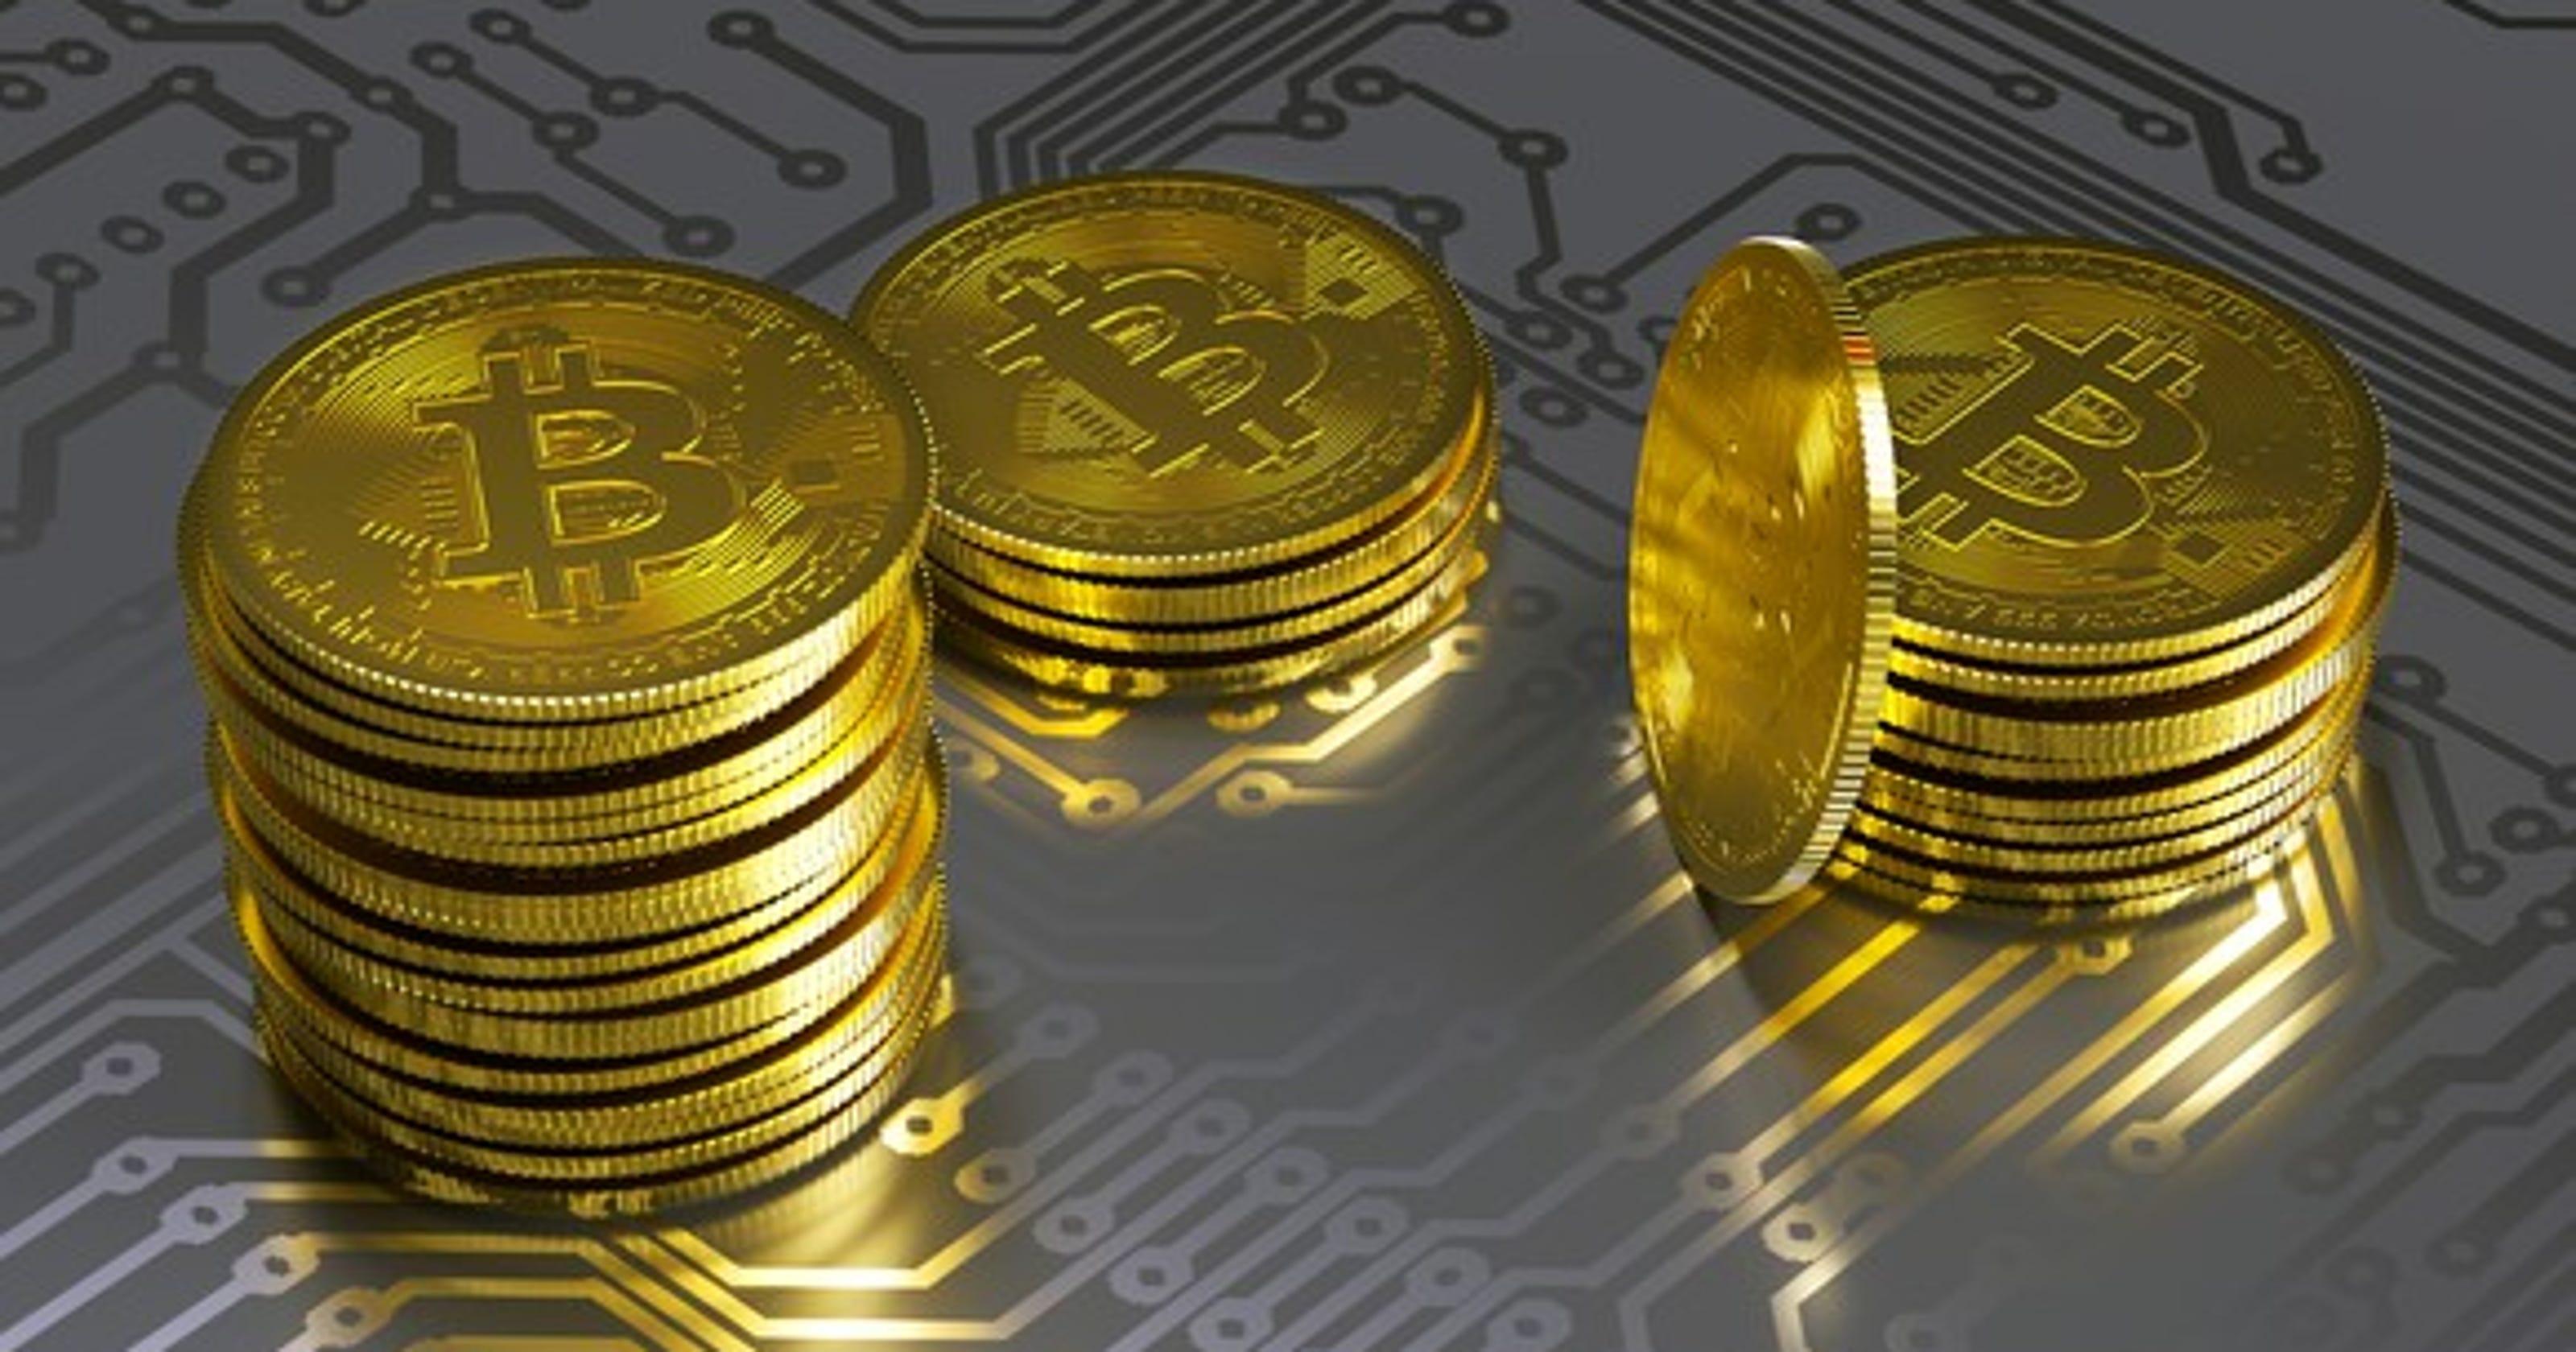 Chuck E  Cheese tokens sold as Bitcoins? A fake story